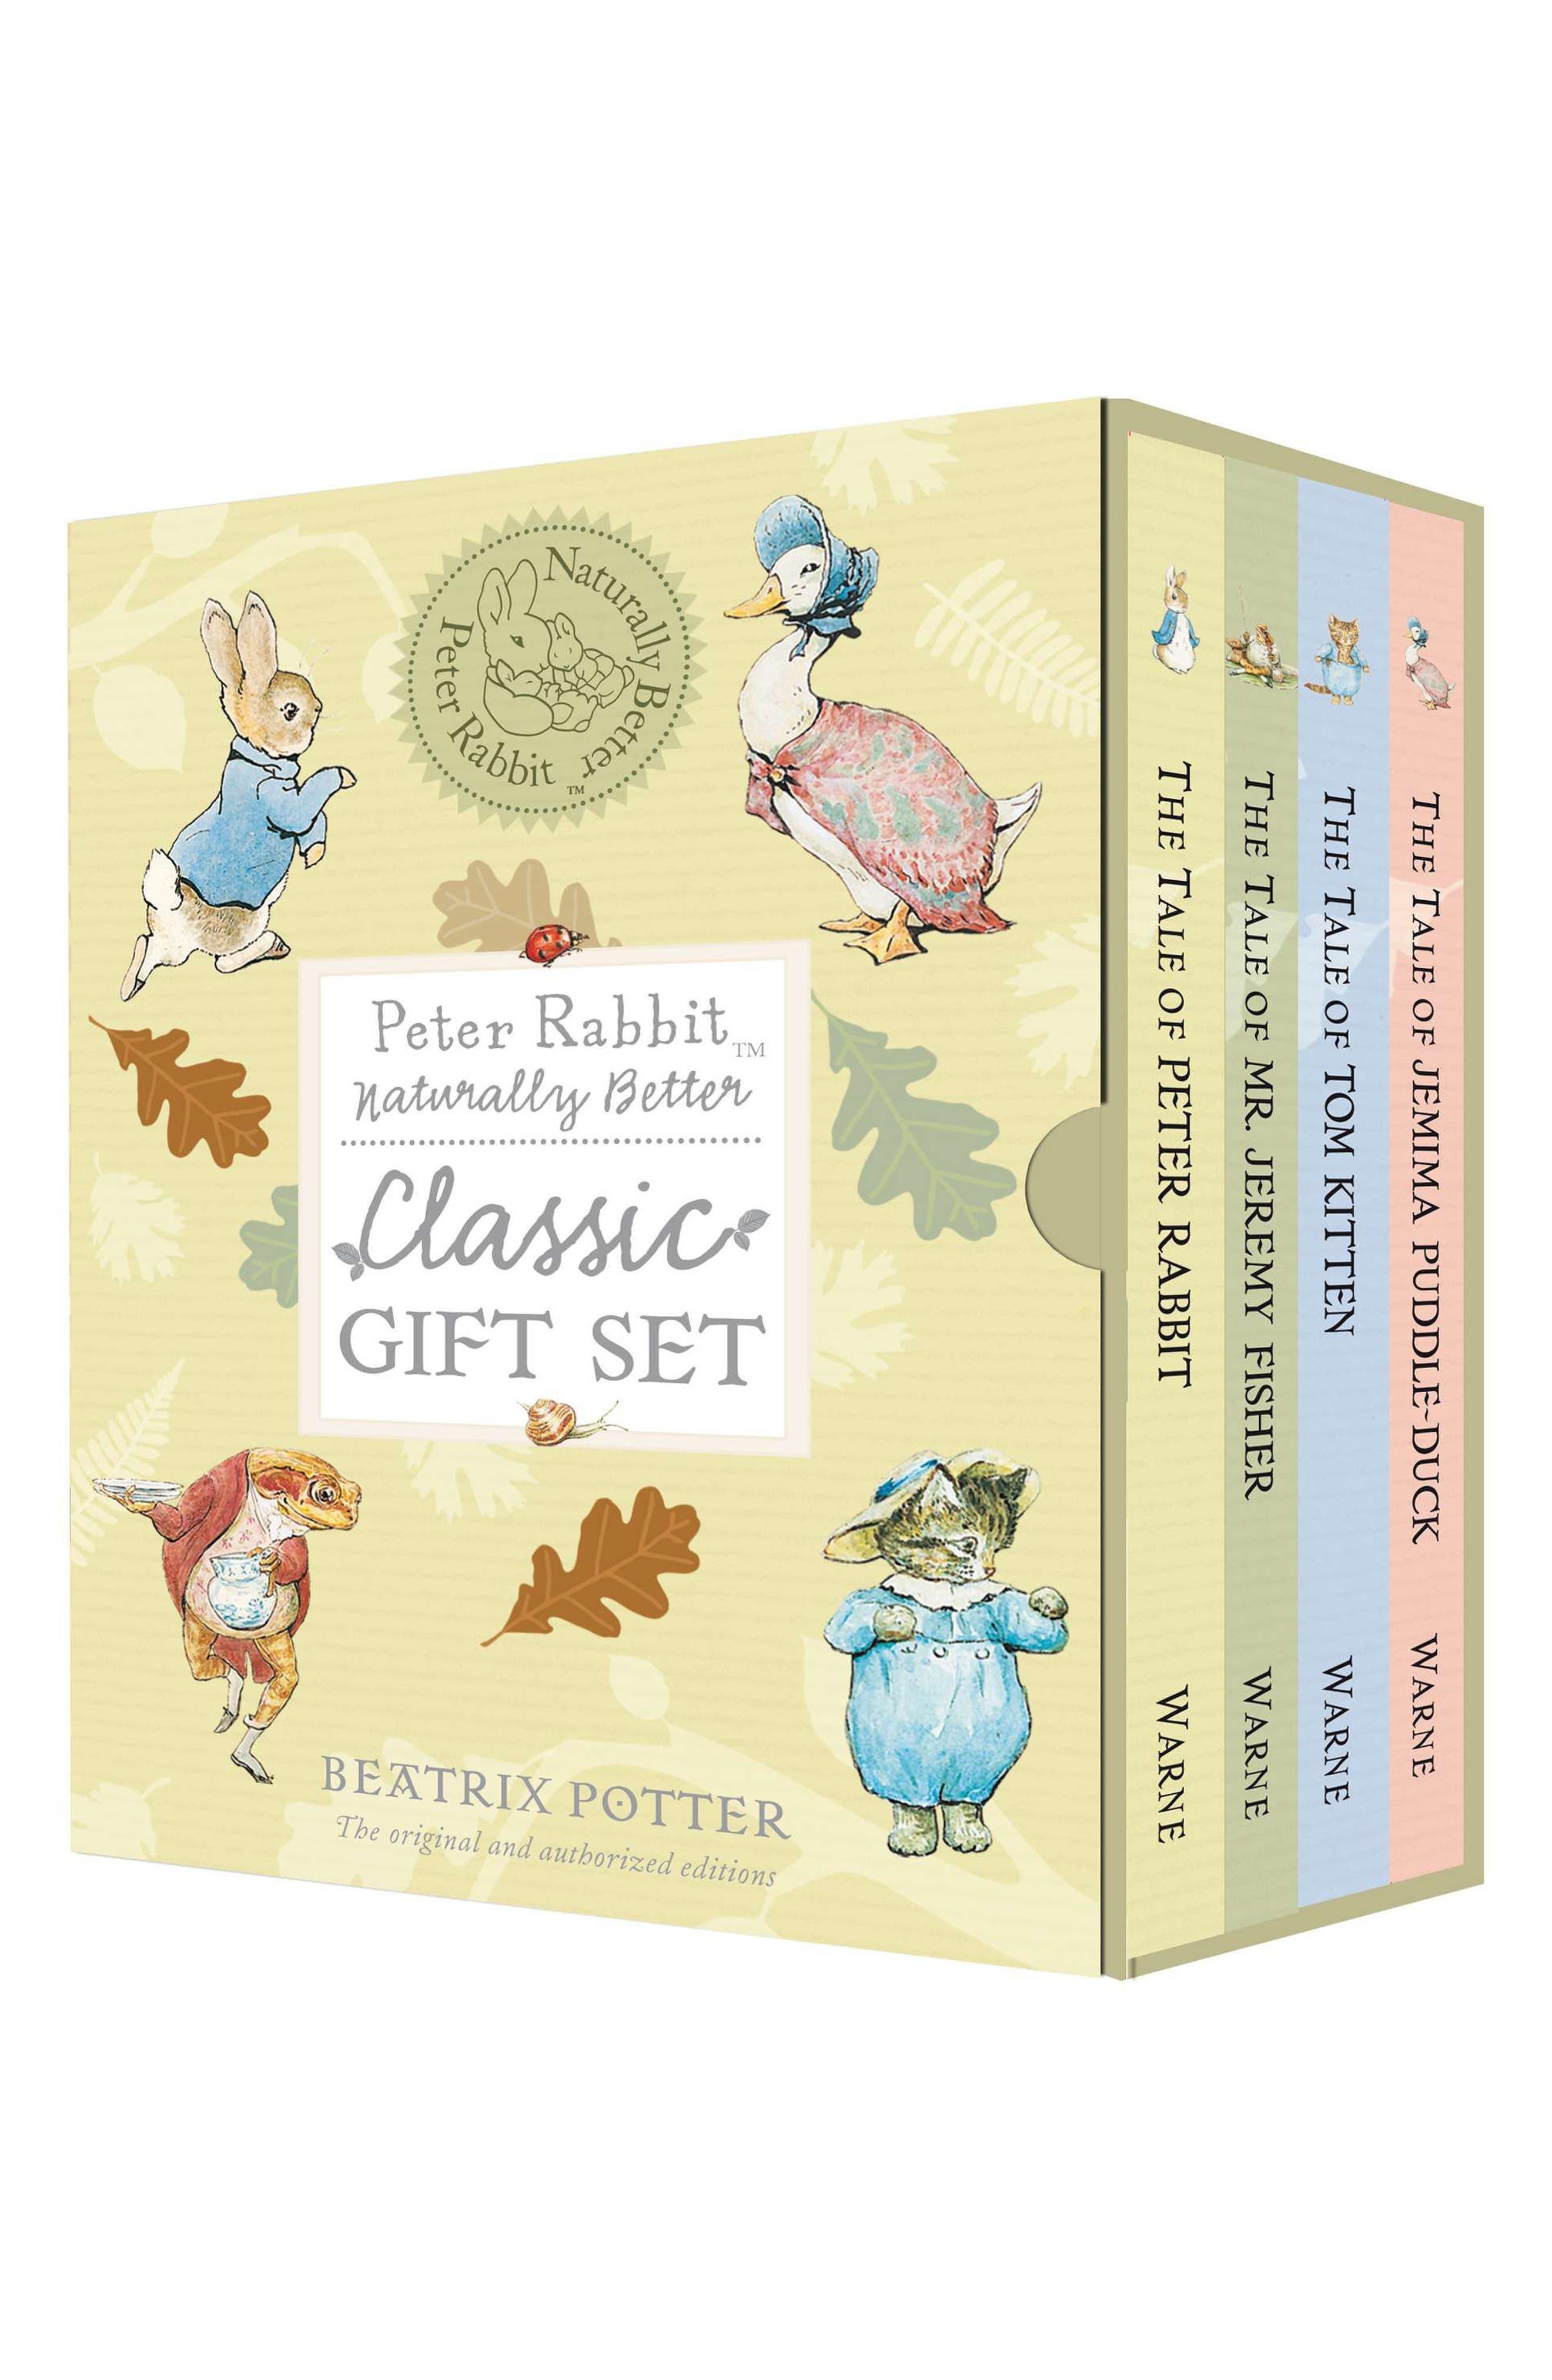 'Peter Rabbit: Naturally Better' Classic Book Gift Set,                             Main thumbnail 1, color,                             Yellow